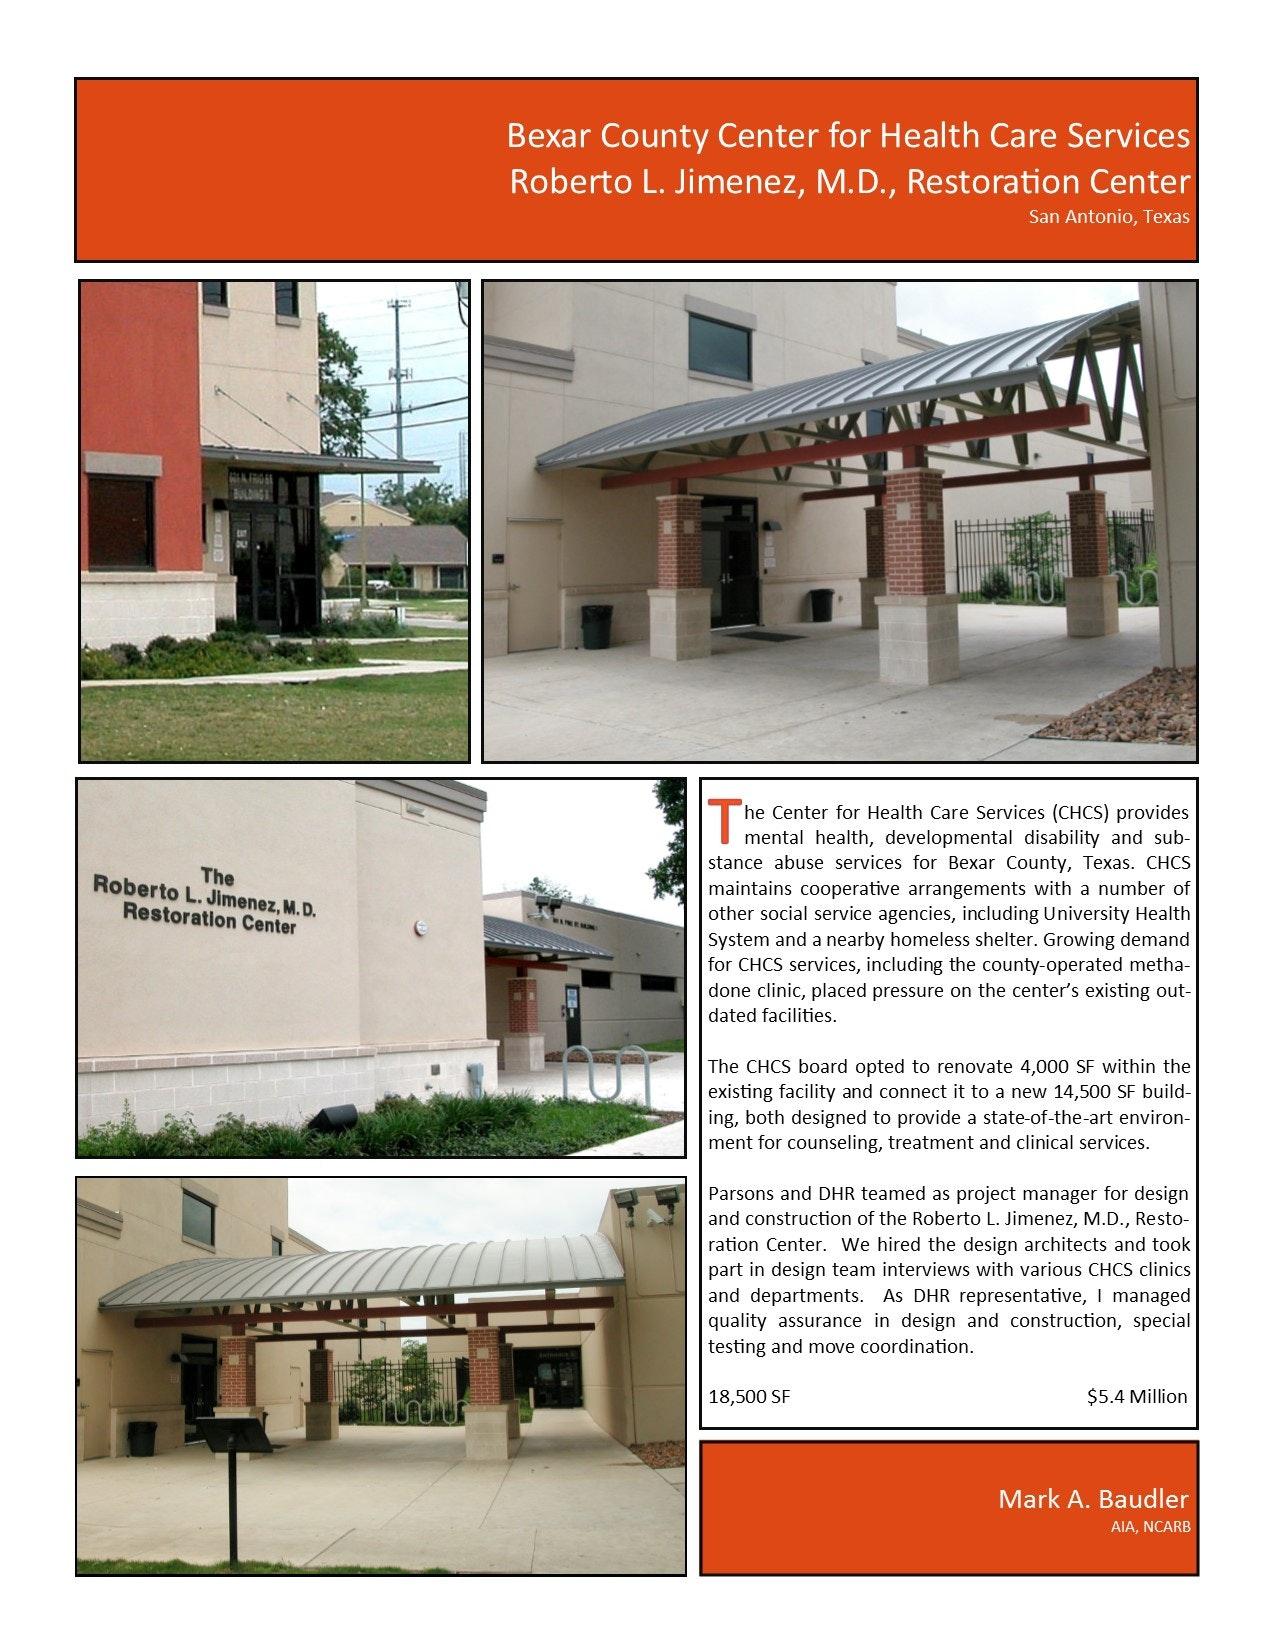 Chcs Roberto L Jimenez M D Restoration Center Mark Baudler